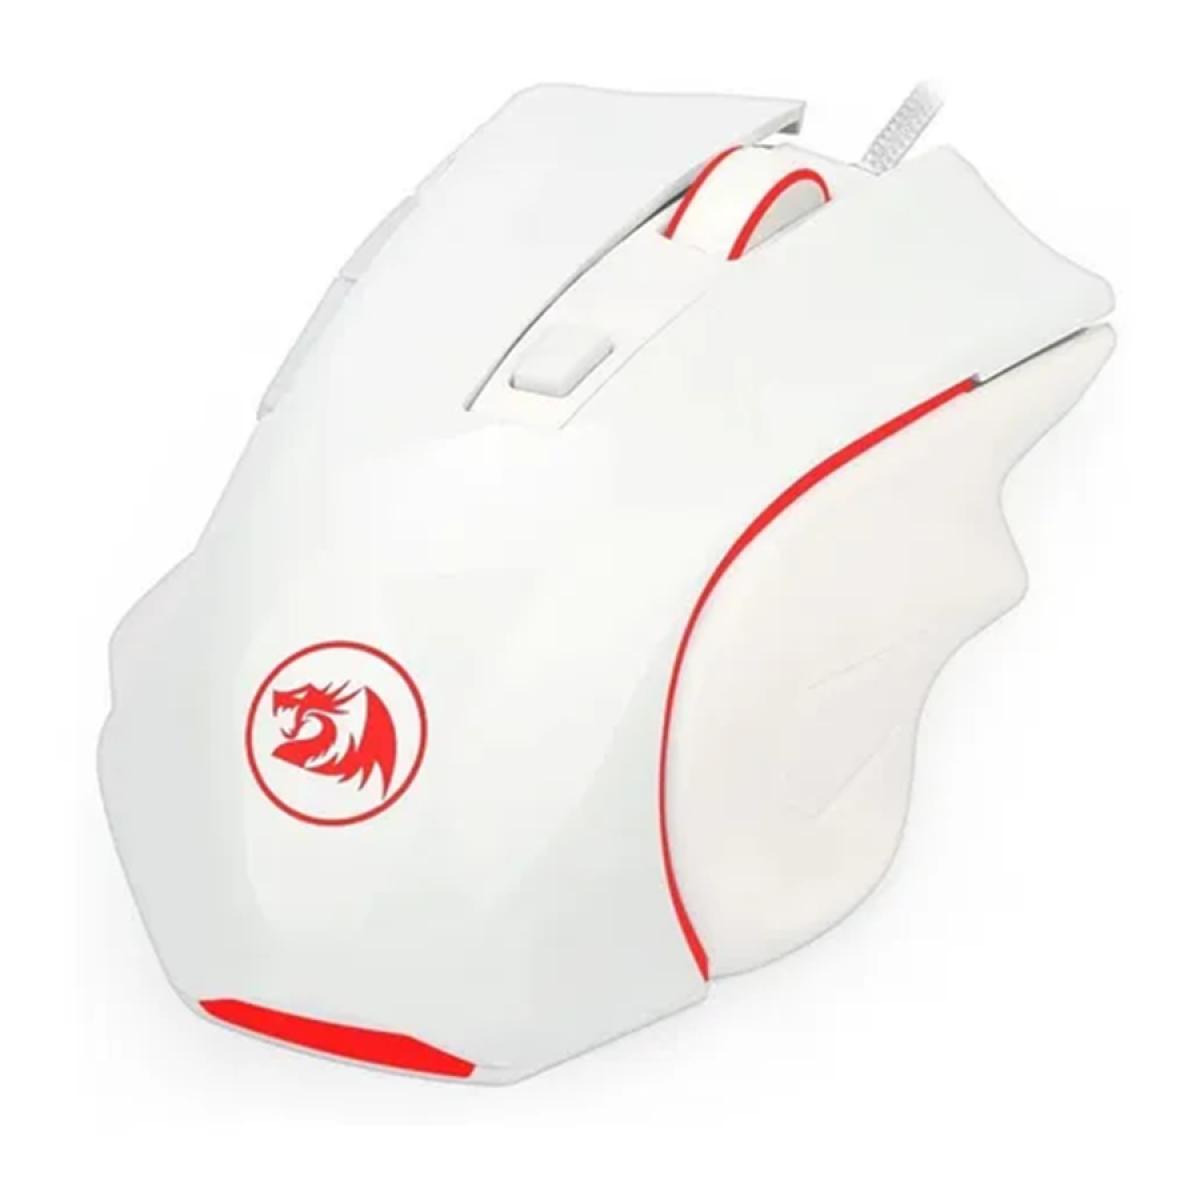 Mouse Gamer Redragon Nothosaur, 3200 DPI, 6 Botões Programáveis, White, M606W